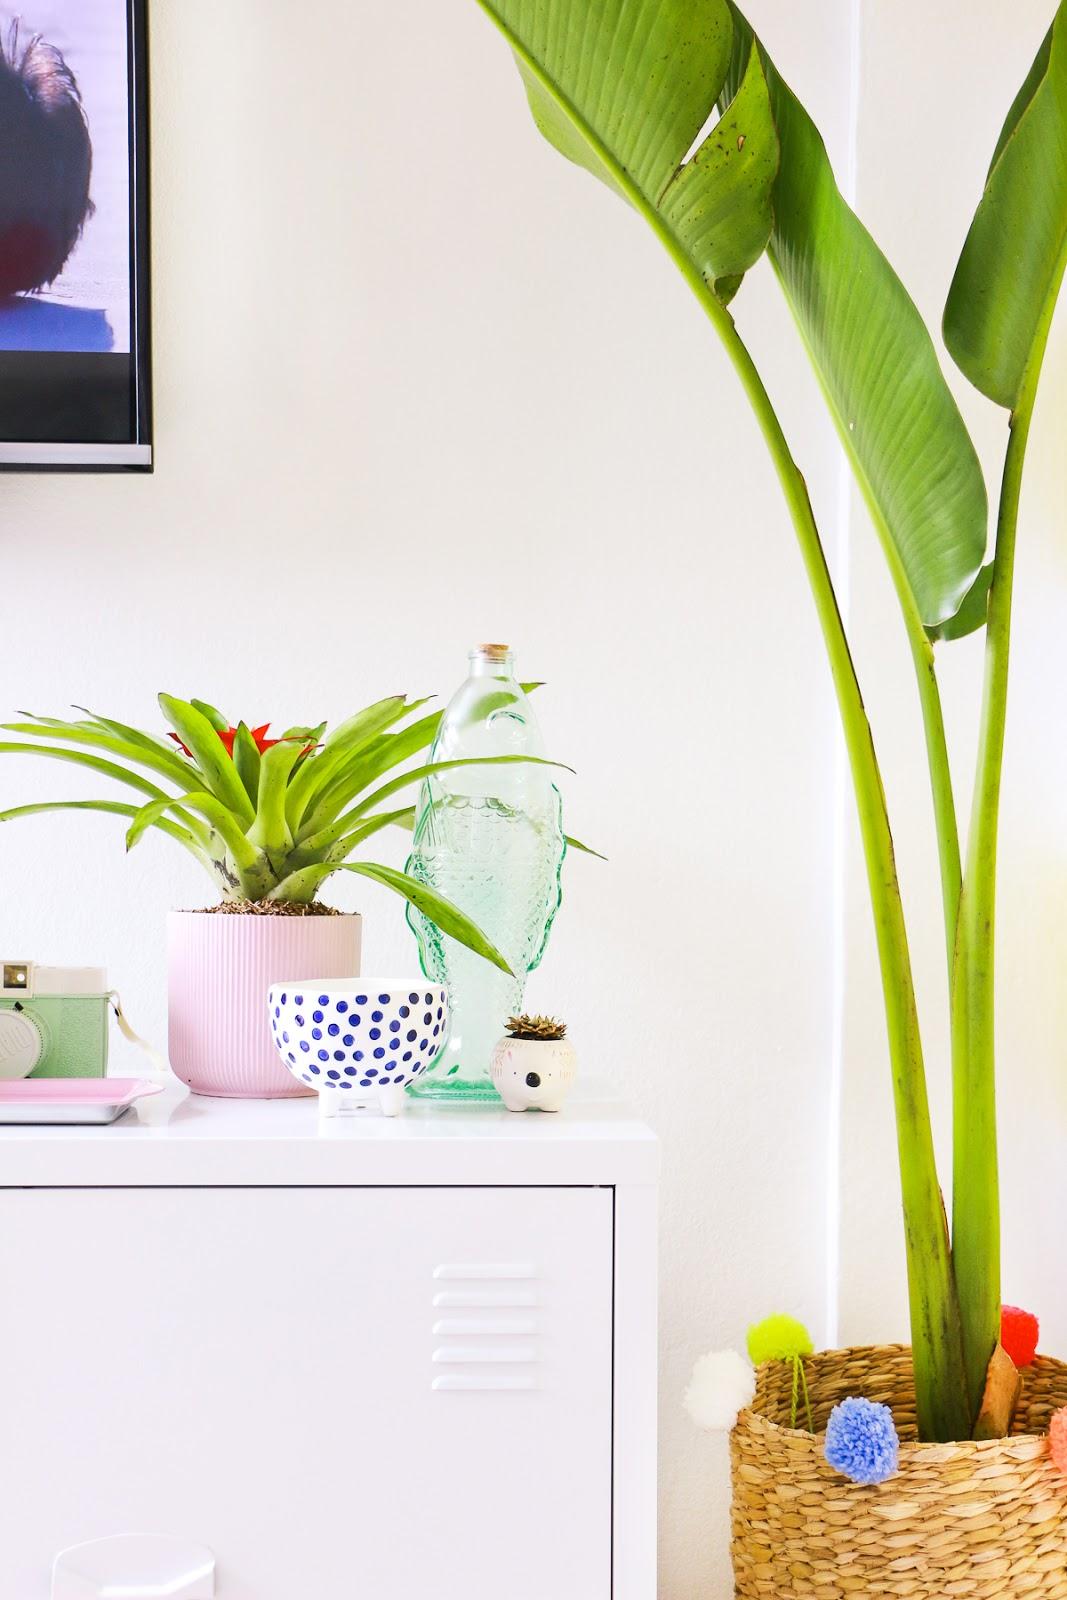 plantas tropicais para dentro de casa ravenala bananeira palmeira bromelia hera jiboia suculentas